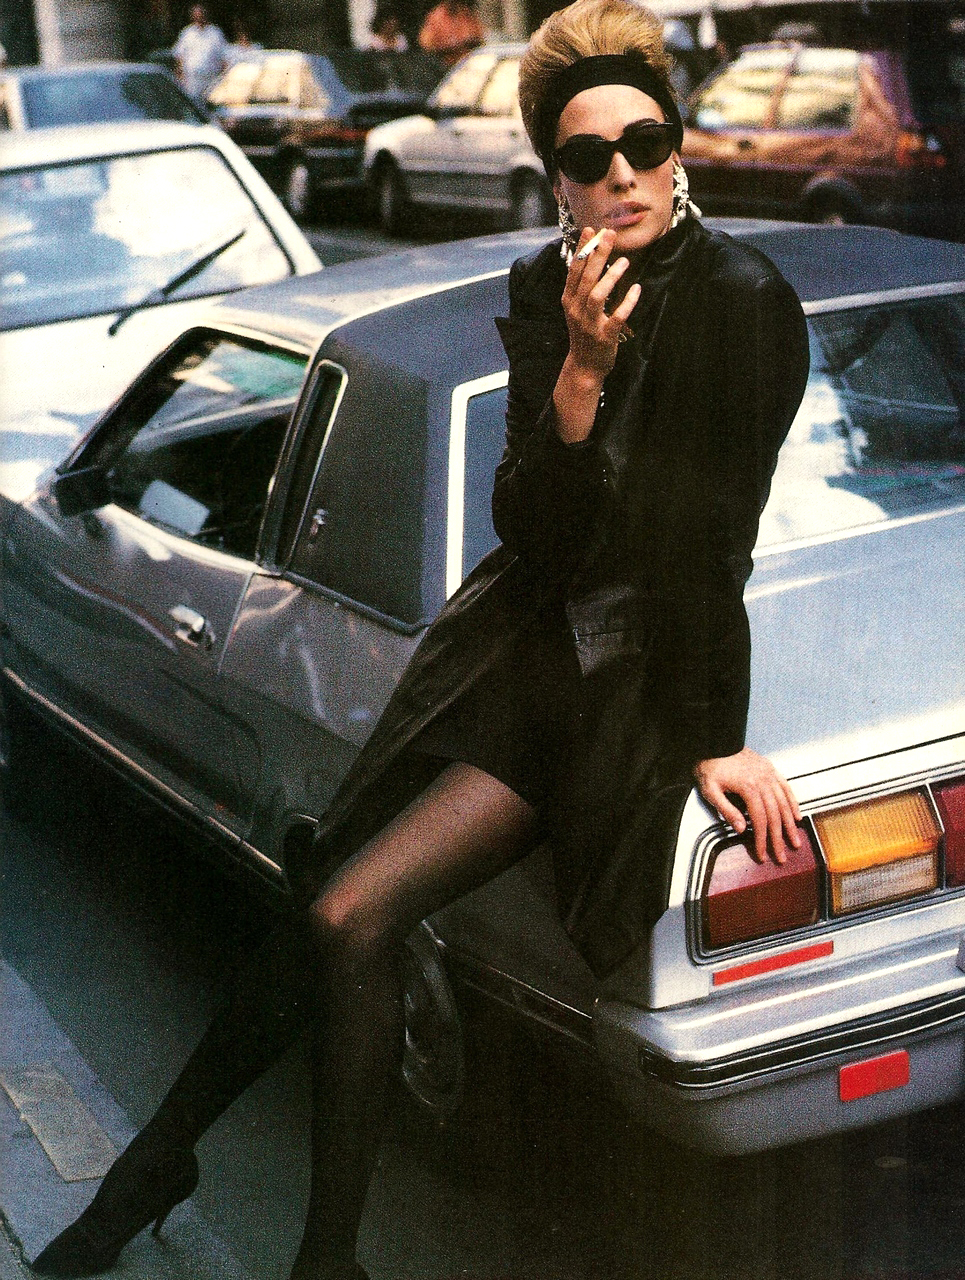 Tatjana Patitz in Vogue Italia October 1990 via www.fashionedbylove.co.uk